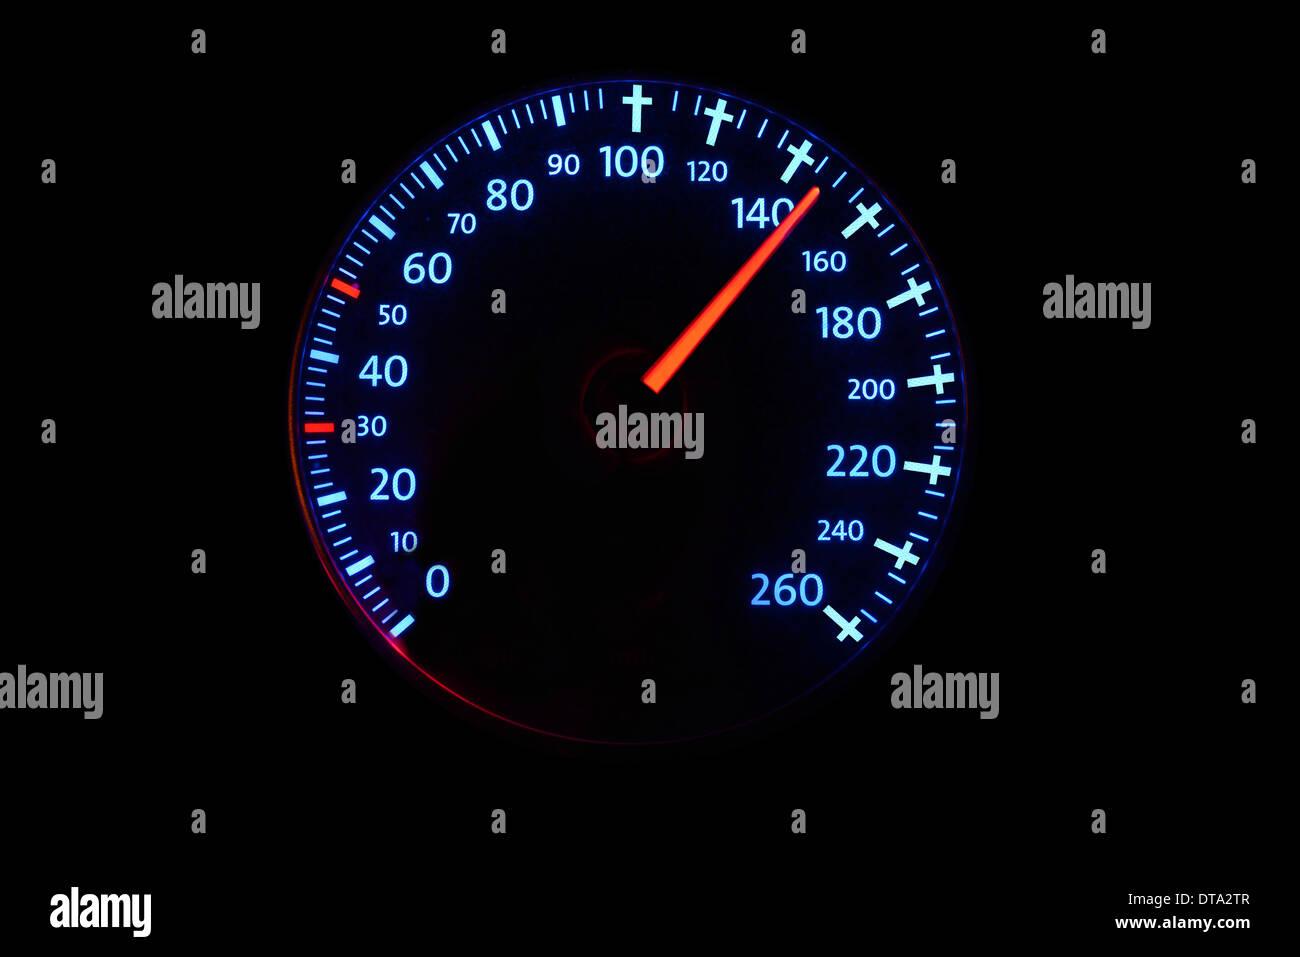 Speedometer with speed indicator vehicle travelling at 140 kmh speedometer with speed indicator vehicle travelling at 140 kmh grave crosses from 100 kmh onwards symbol image buycottarizona